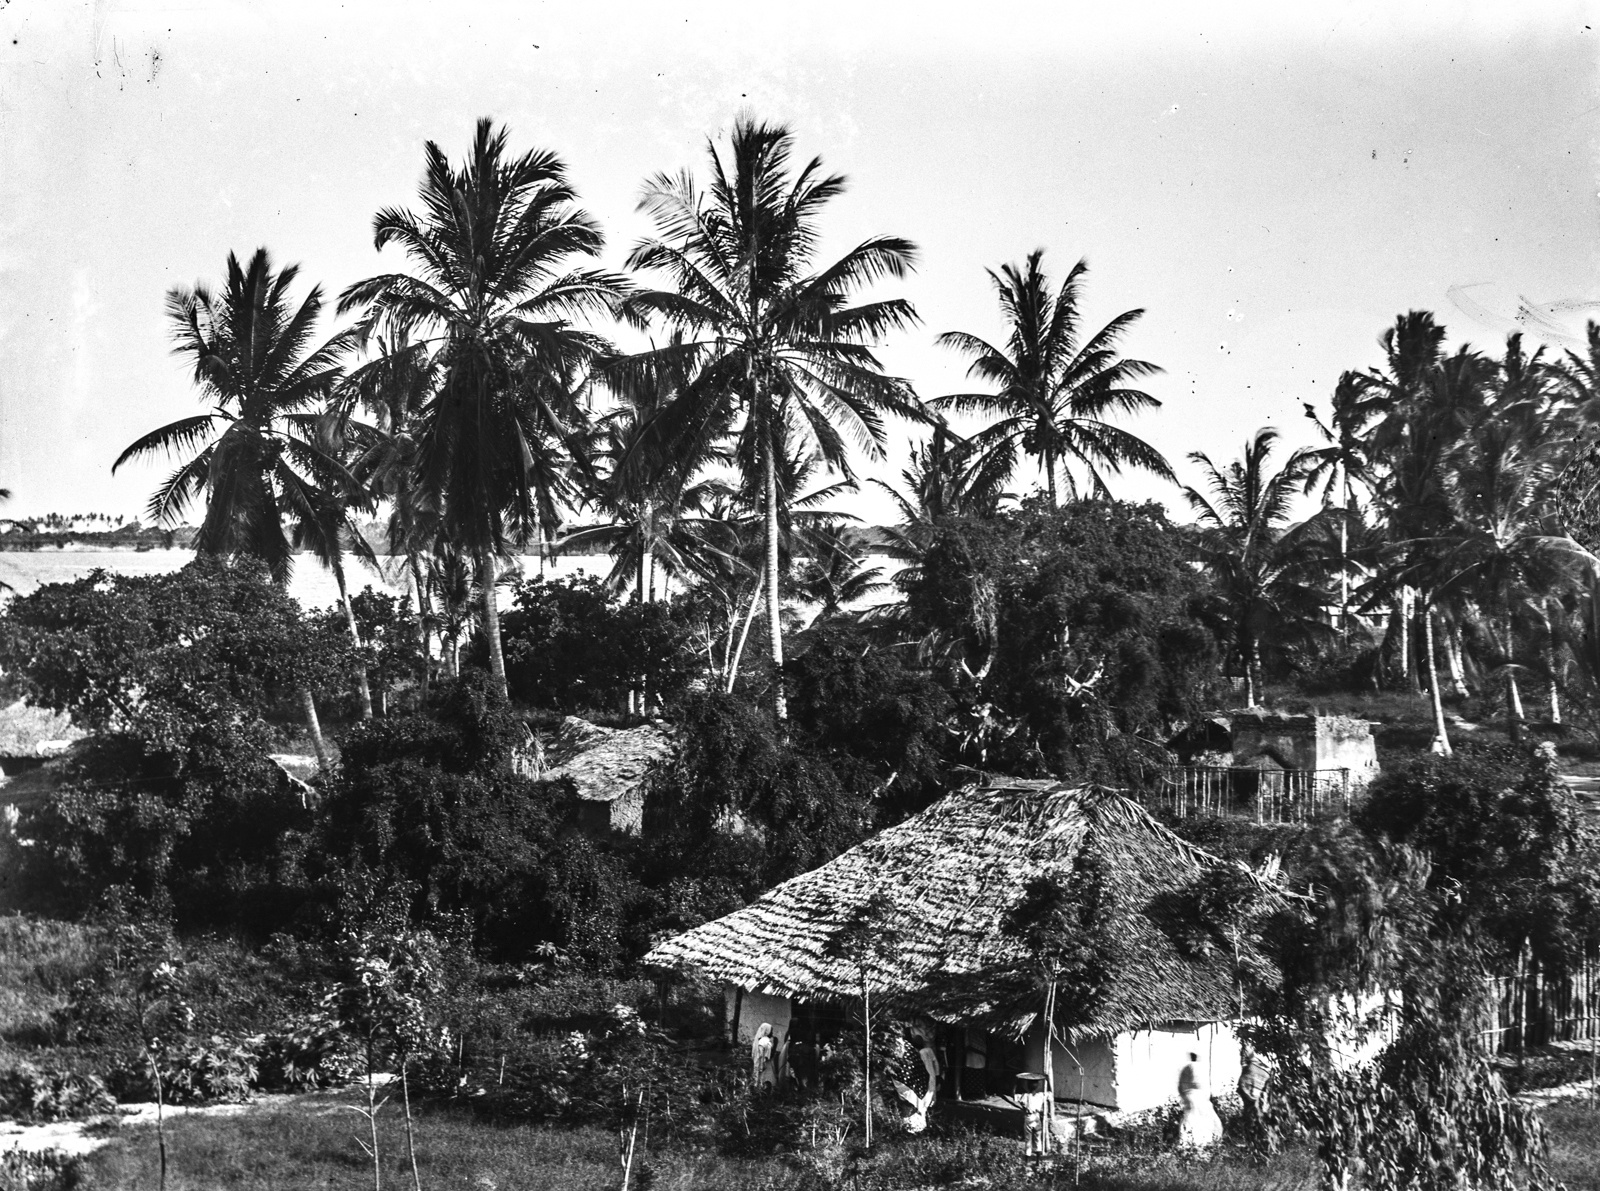 186. Поселение на побережье, в районе Дар-эс-Салама